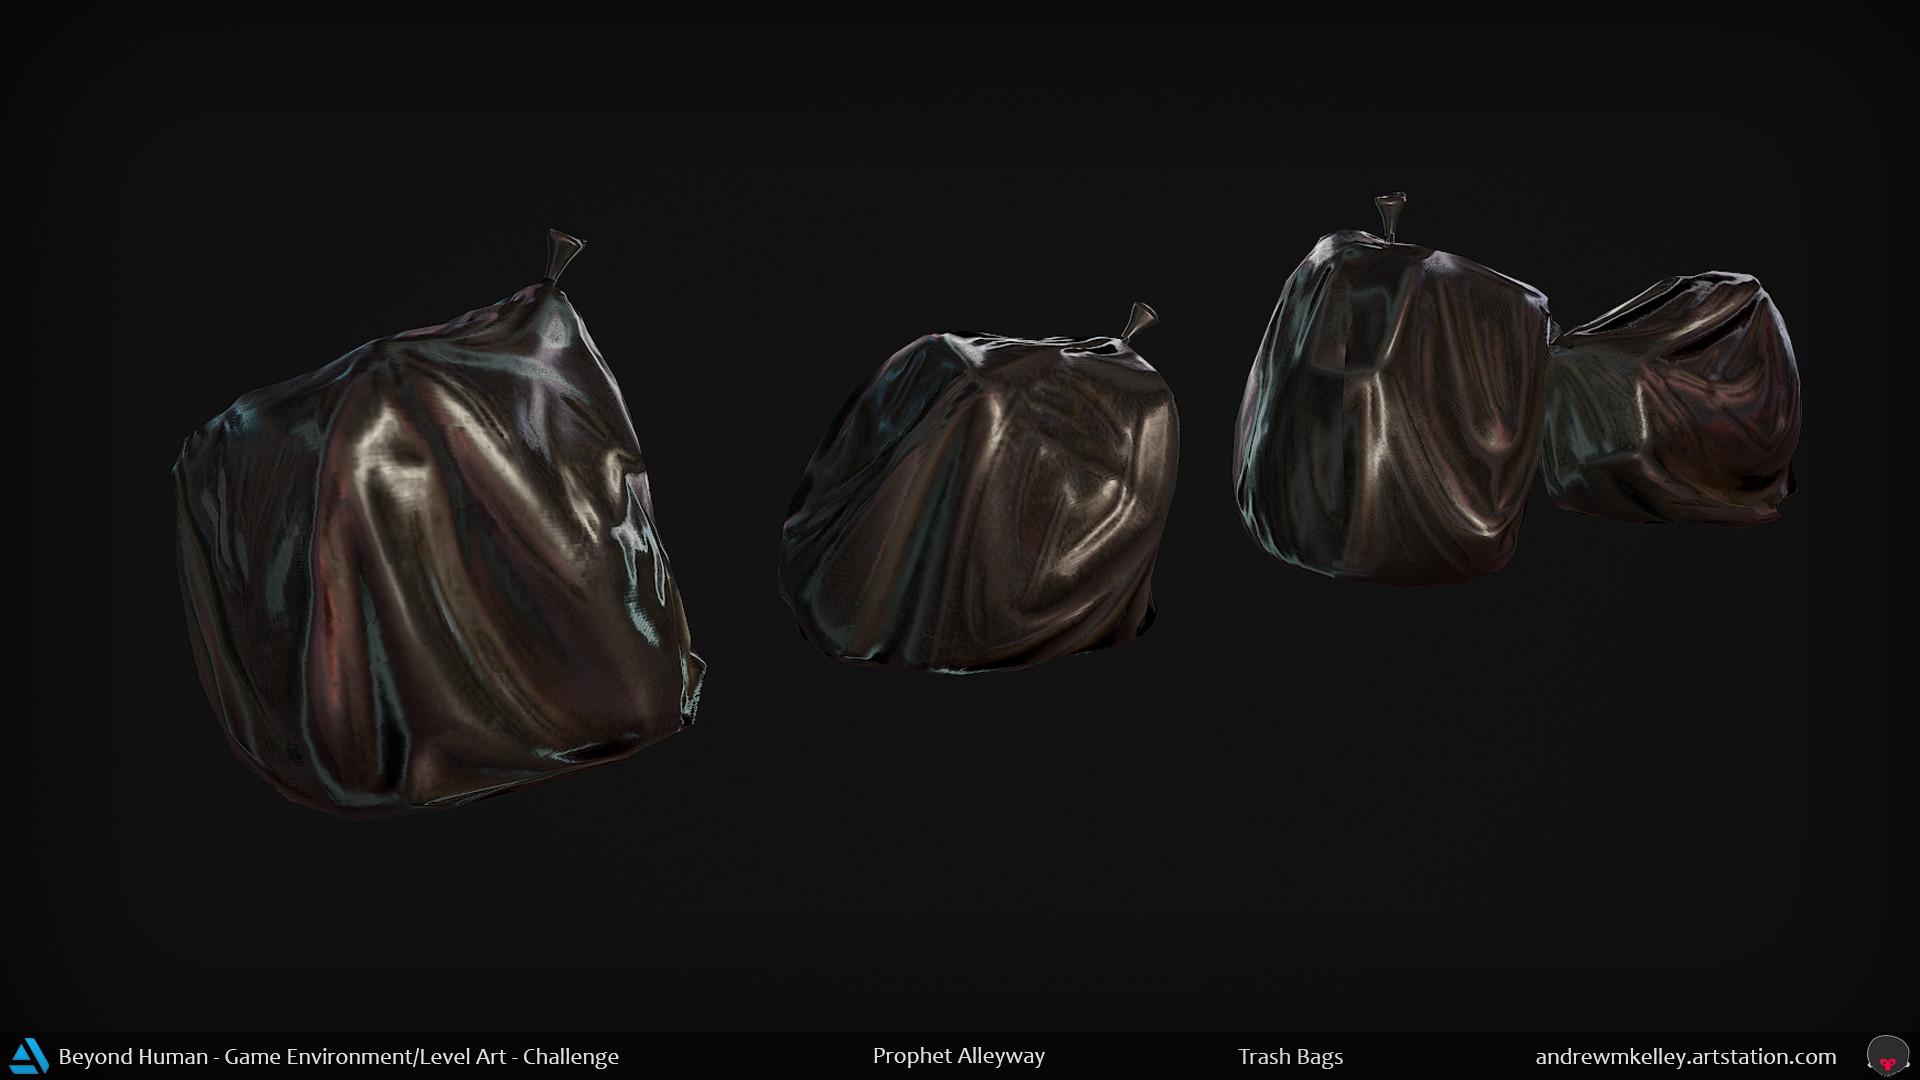 Andrew kelley propshot trashbags02